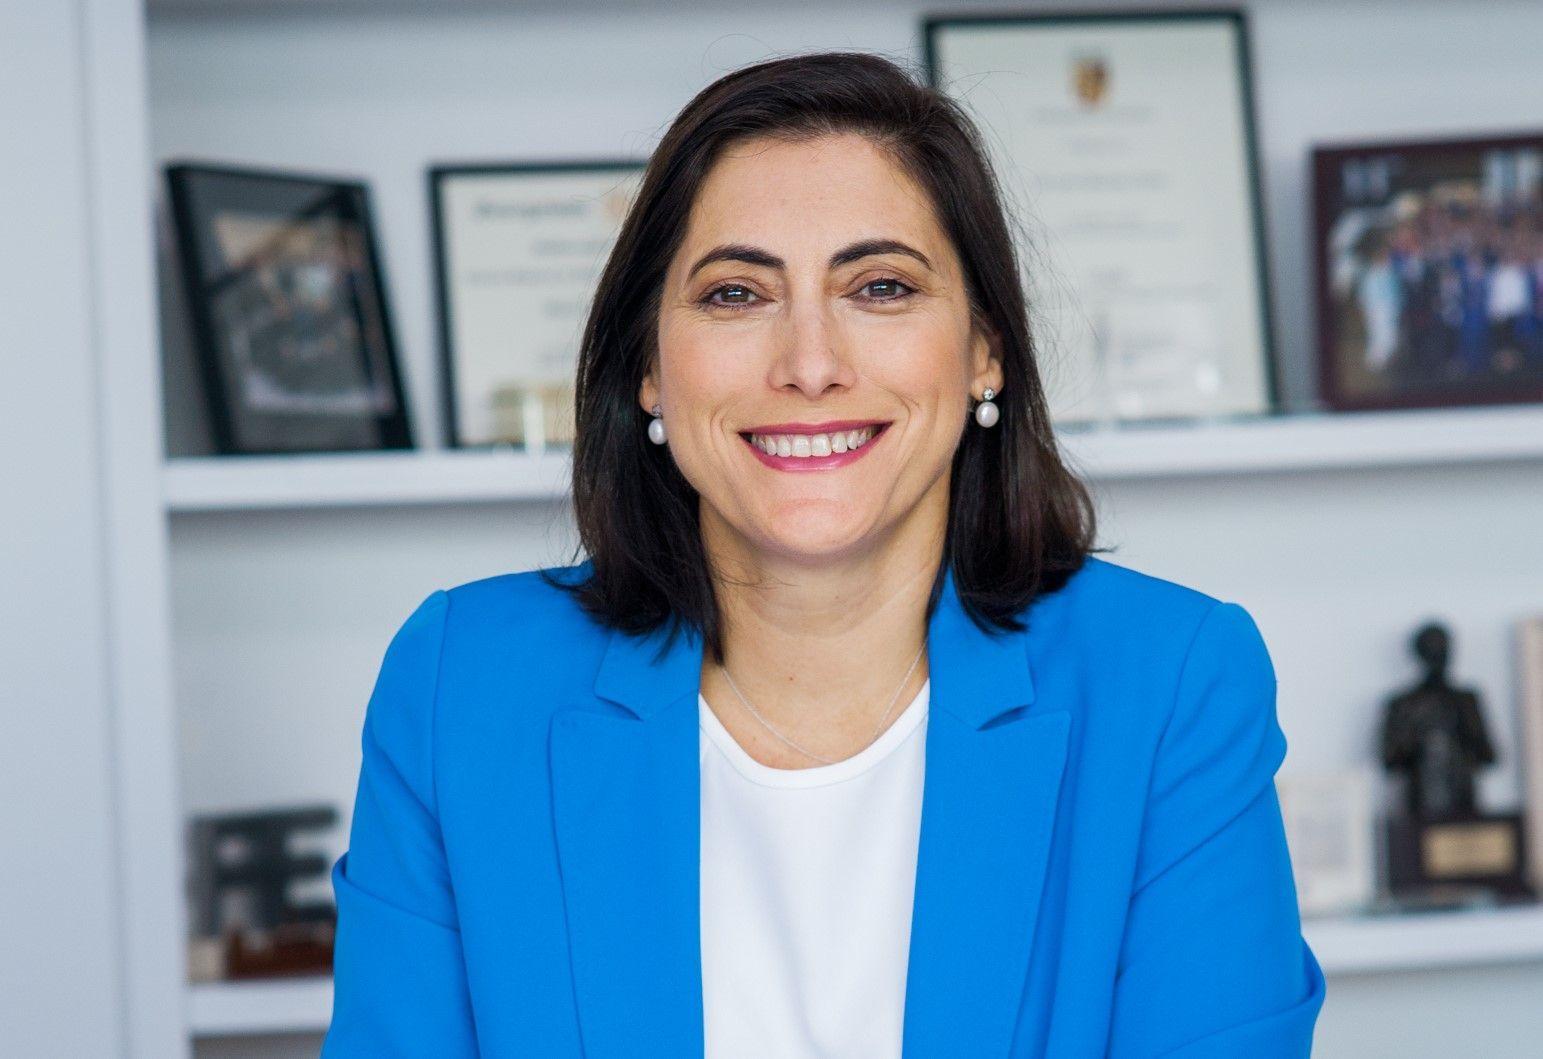 Mª Luisa Martínez Gistau